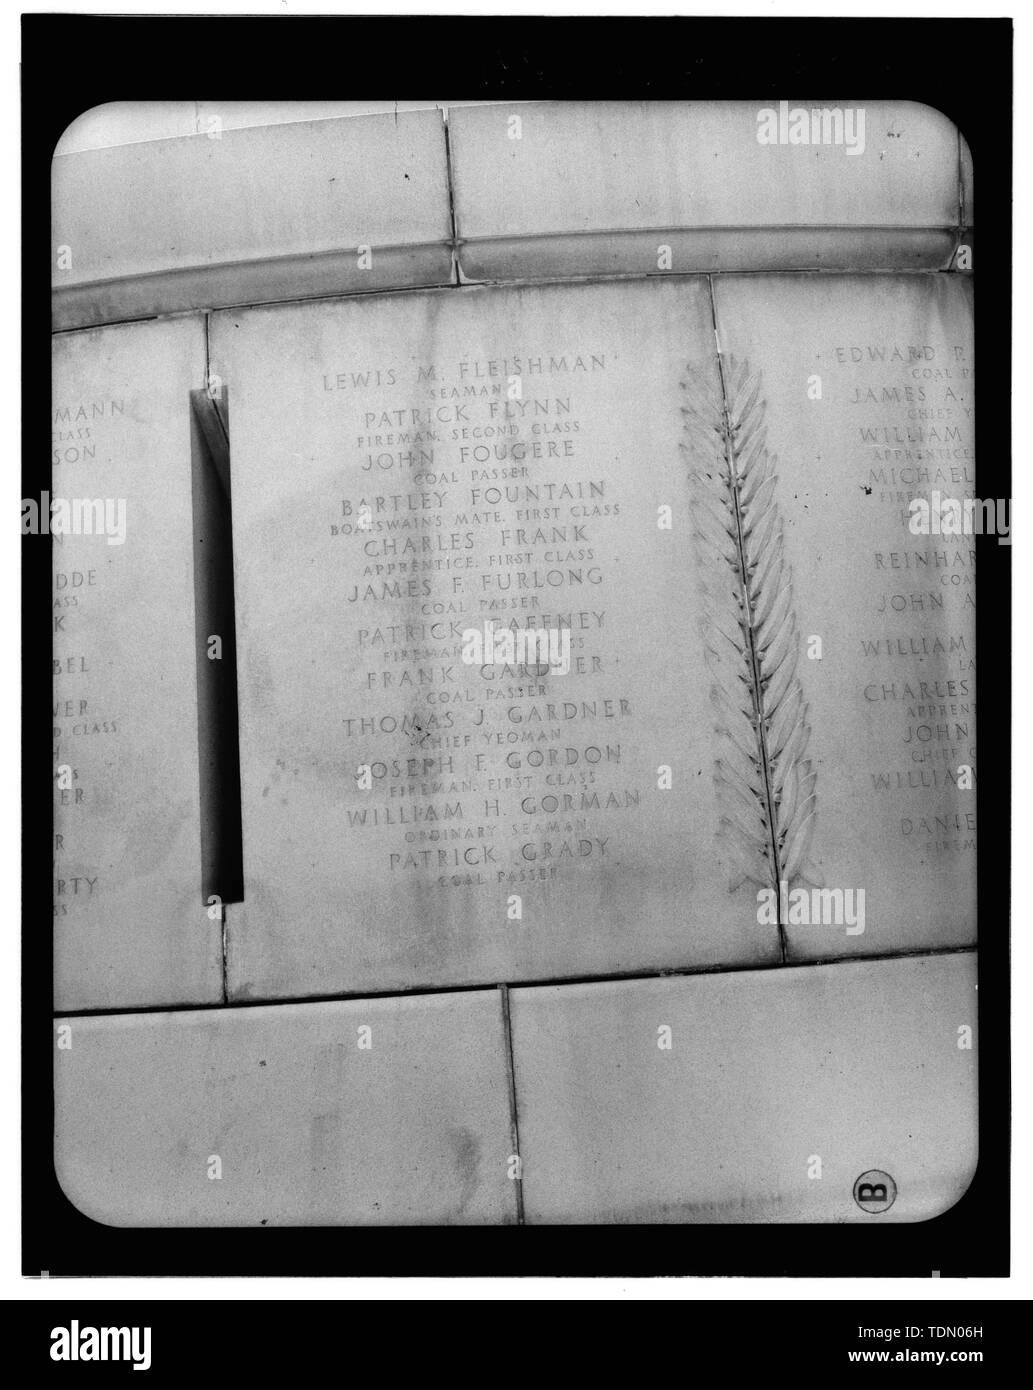 Panel 6 - Arlington National Cemetery, USS Maine Memorial, Arlington, Arlington County, VA; U.S. Army Corps of Engineers; Wyeth, Nathan C; Black, William M; Patrick, Mason M; Ferguson, H B; Bixby, W H; Goodson, W F; Lackawanna Steel Company; T.L. Huston Construction Company; Harris Brothers; Clark, D Lombillo; Primelles, Arturo; Rhodes, D H; Jenkins, Oliver B; Tilford, James D; Aleshire, J B; Stimson, H E; Scofield, John J; Hugh, R P; Houston, J B; Sharpe, Henry G; Downey, G F; Clem, L; Cosby, Spencer; Taft, William Howard; Commission of Fine Arts; Olmsted, Fredrick Law; French, Daniel Chester - Stock Image